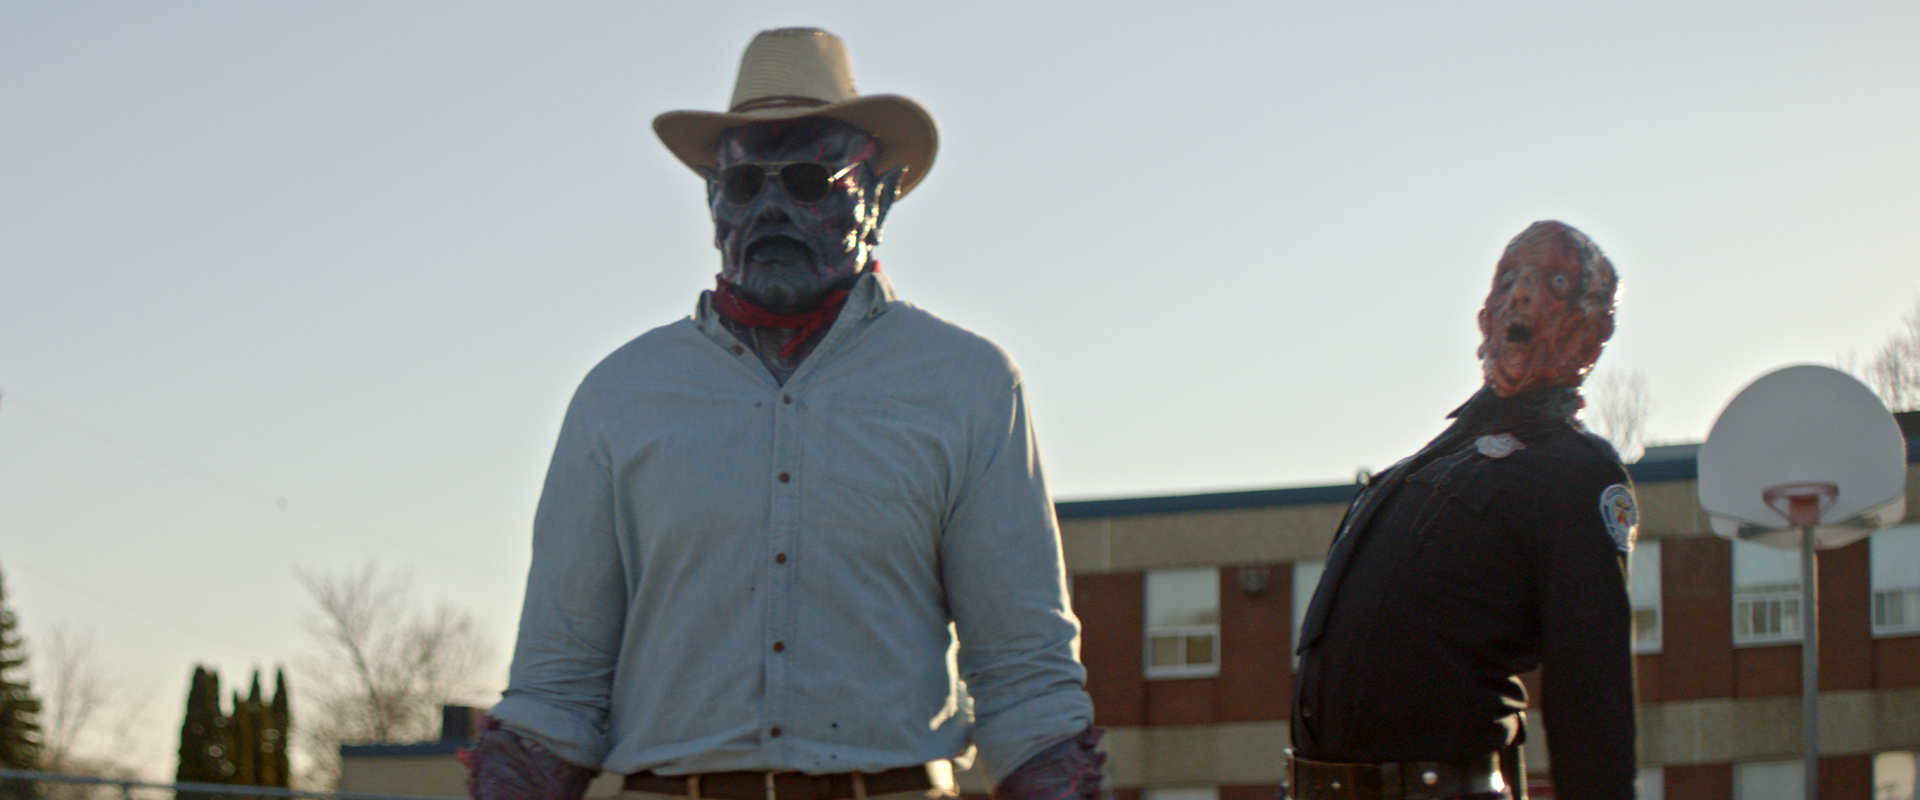 Psycho Goreman (2020)   Kisafilms.com